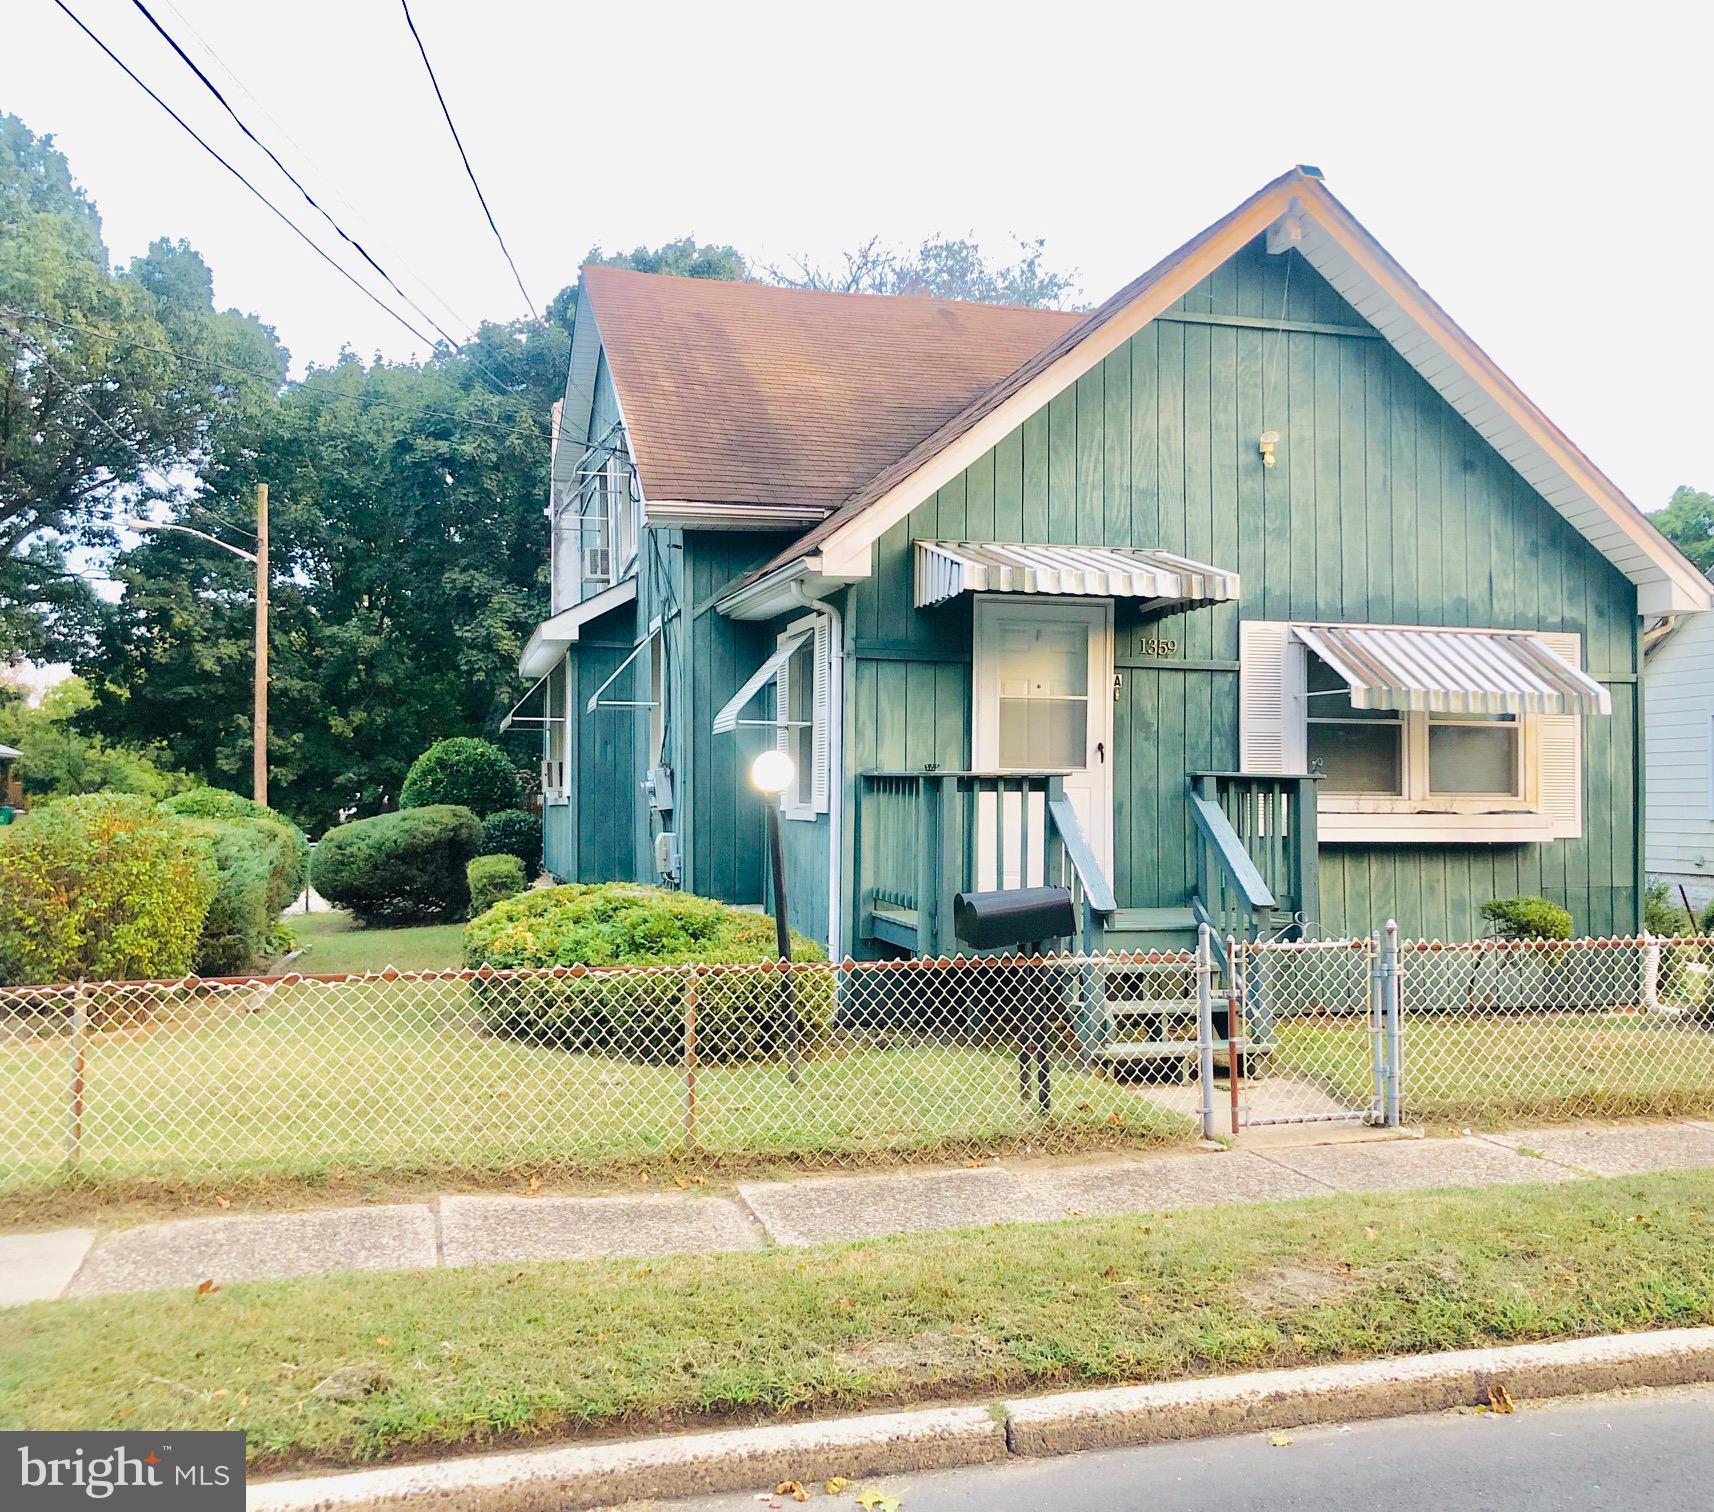 1359 CROWN POINT ROAD, WESTVILLE, NJ 08093